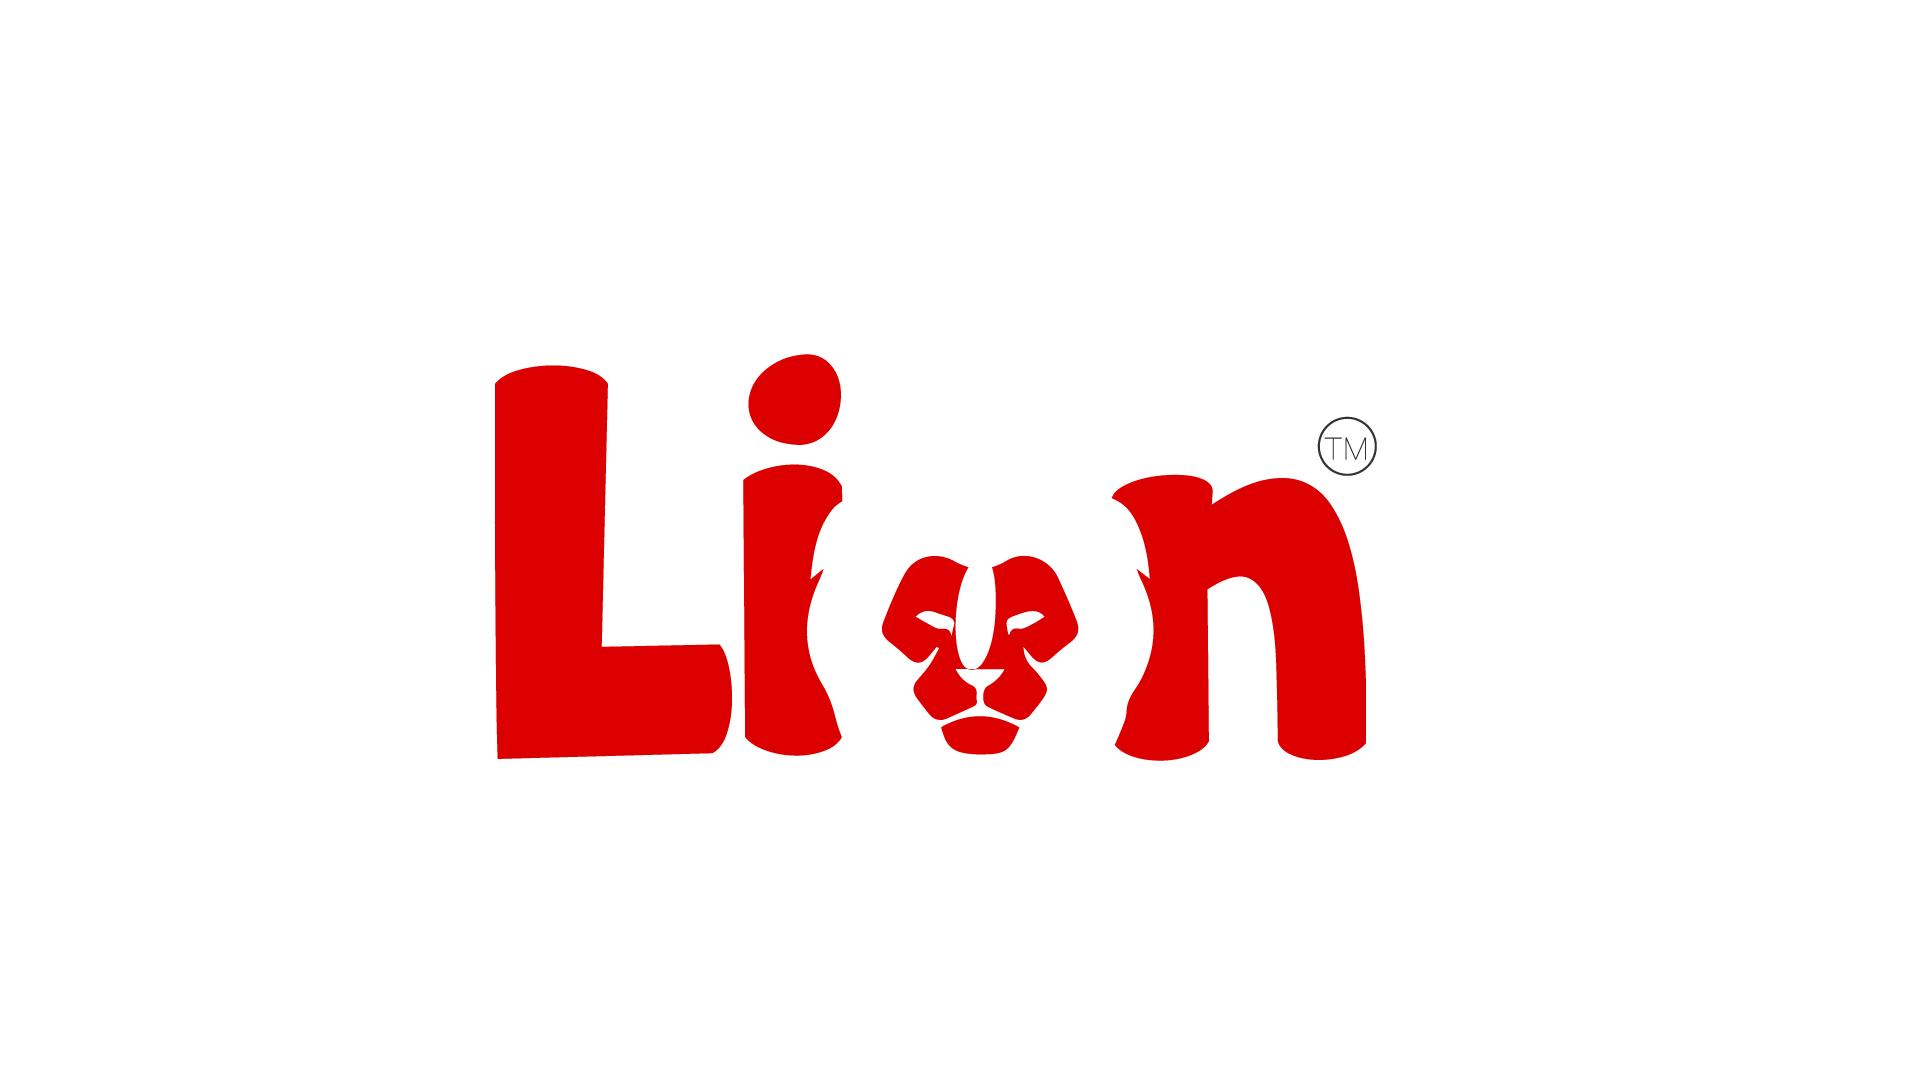 Make Clean and Modern Logo Designs